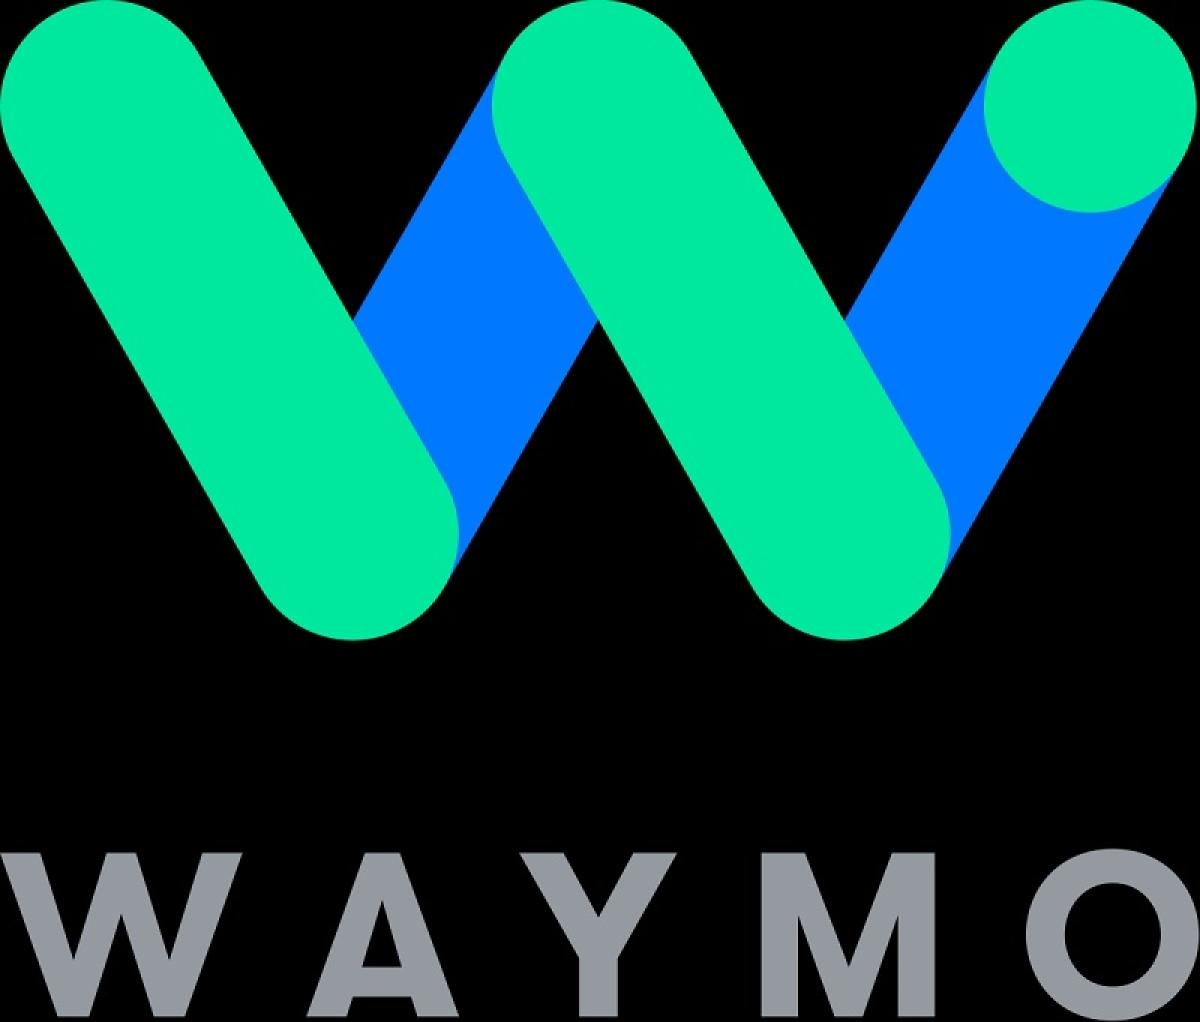 Waymo to sell laser-based distance measuring sensors